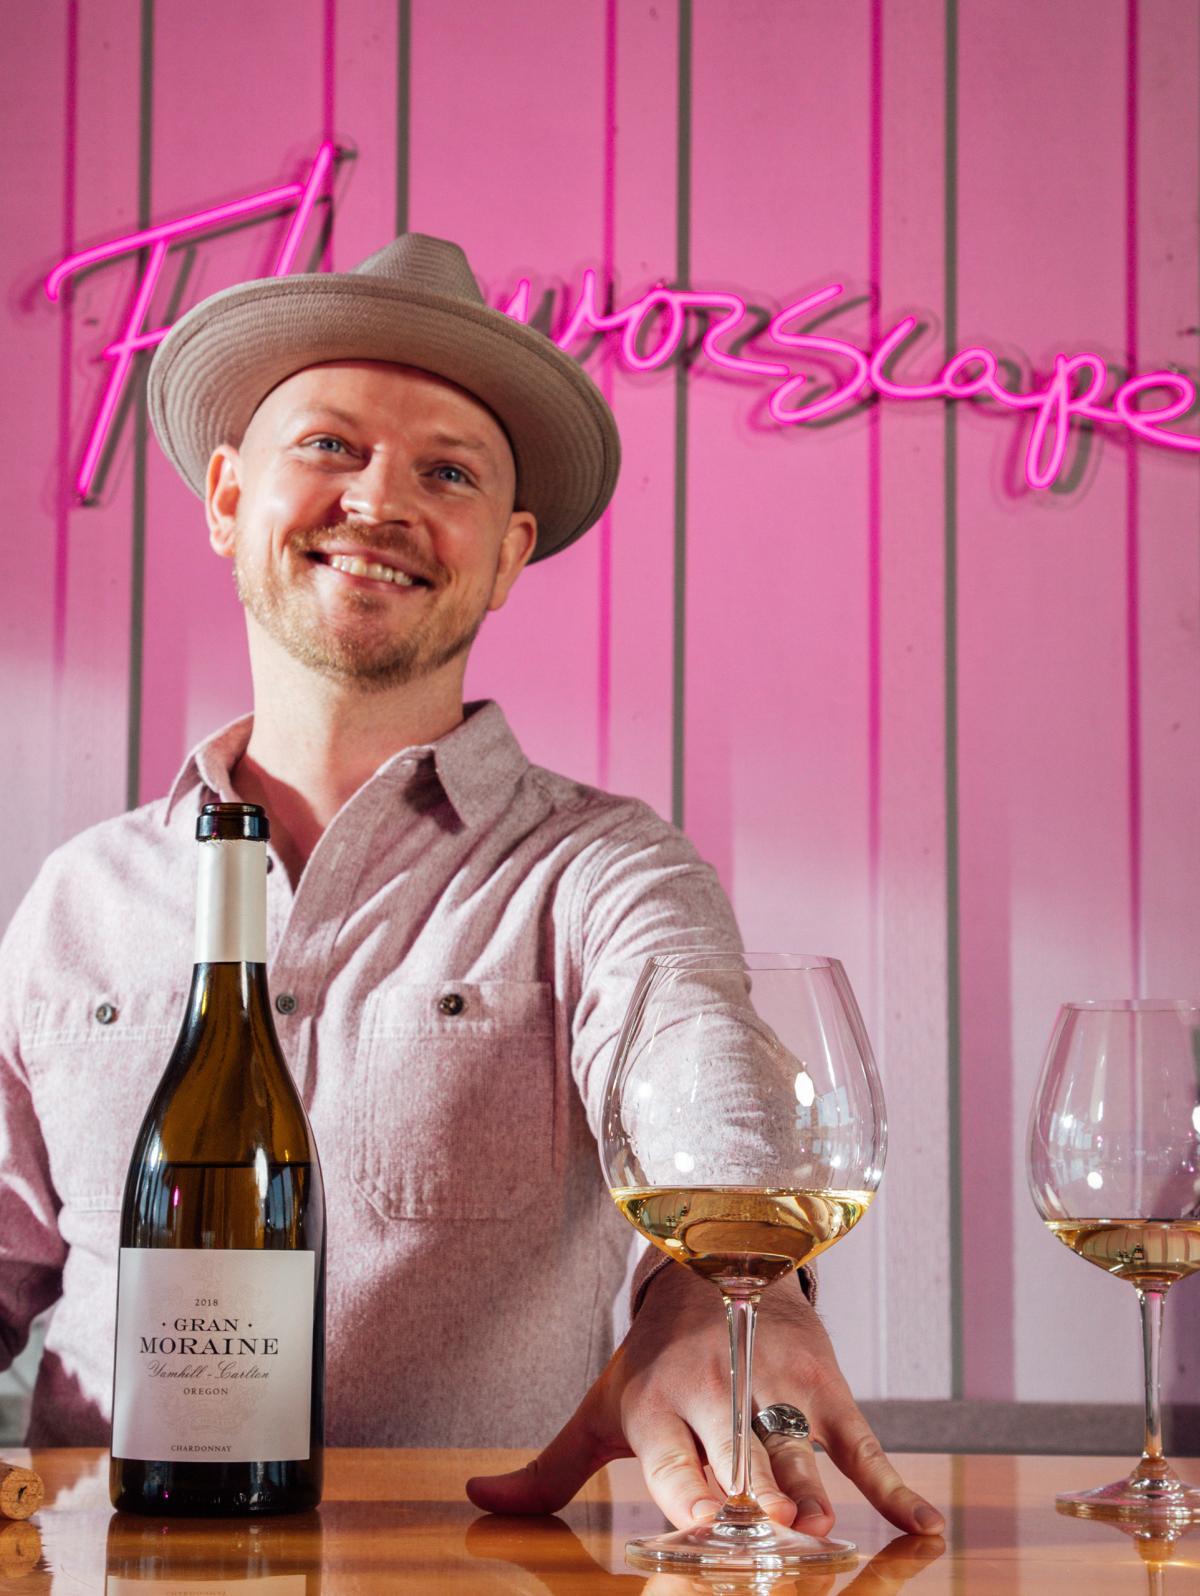 Man behind bar serving Gran Moraine white wine